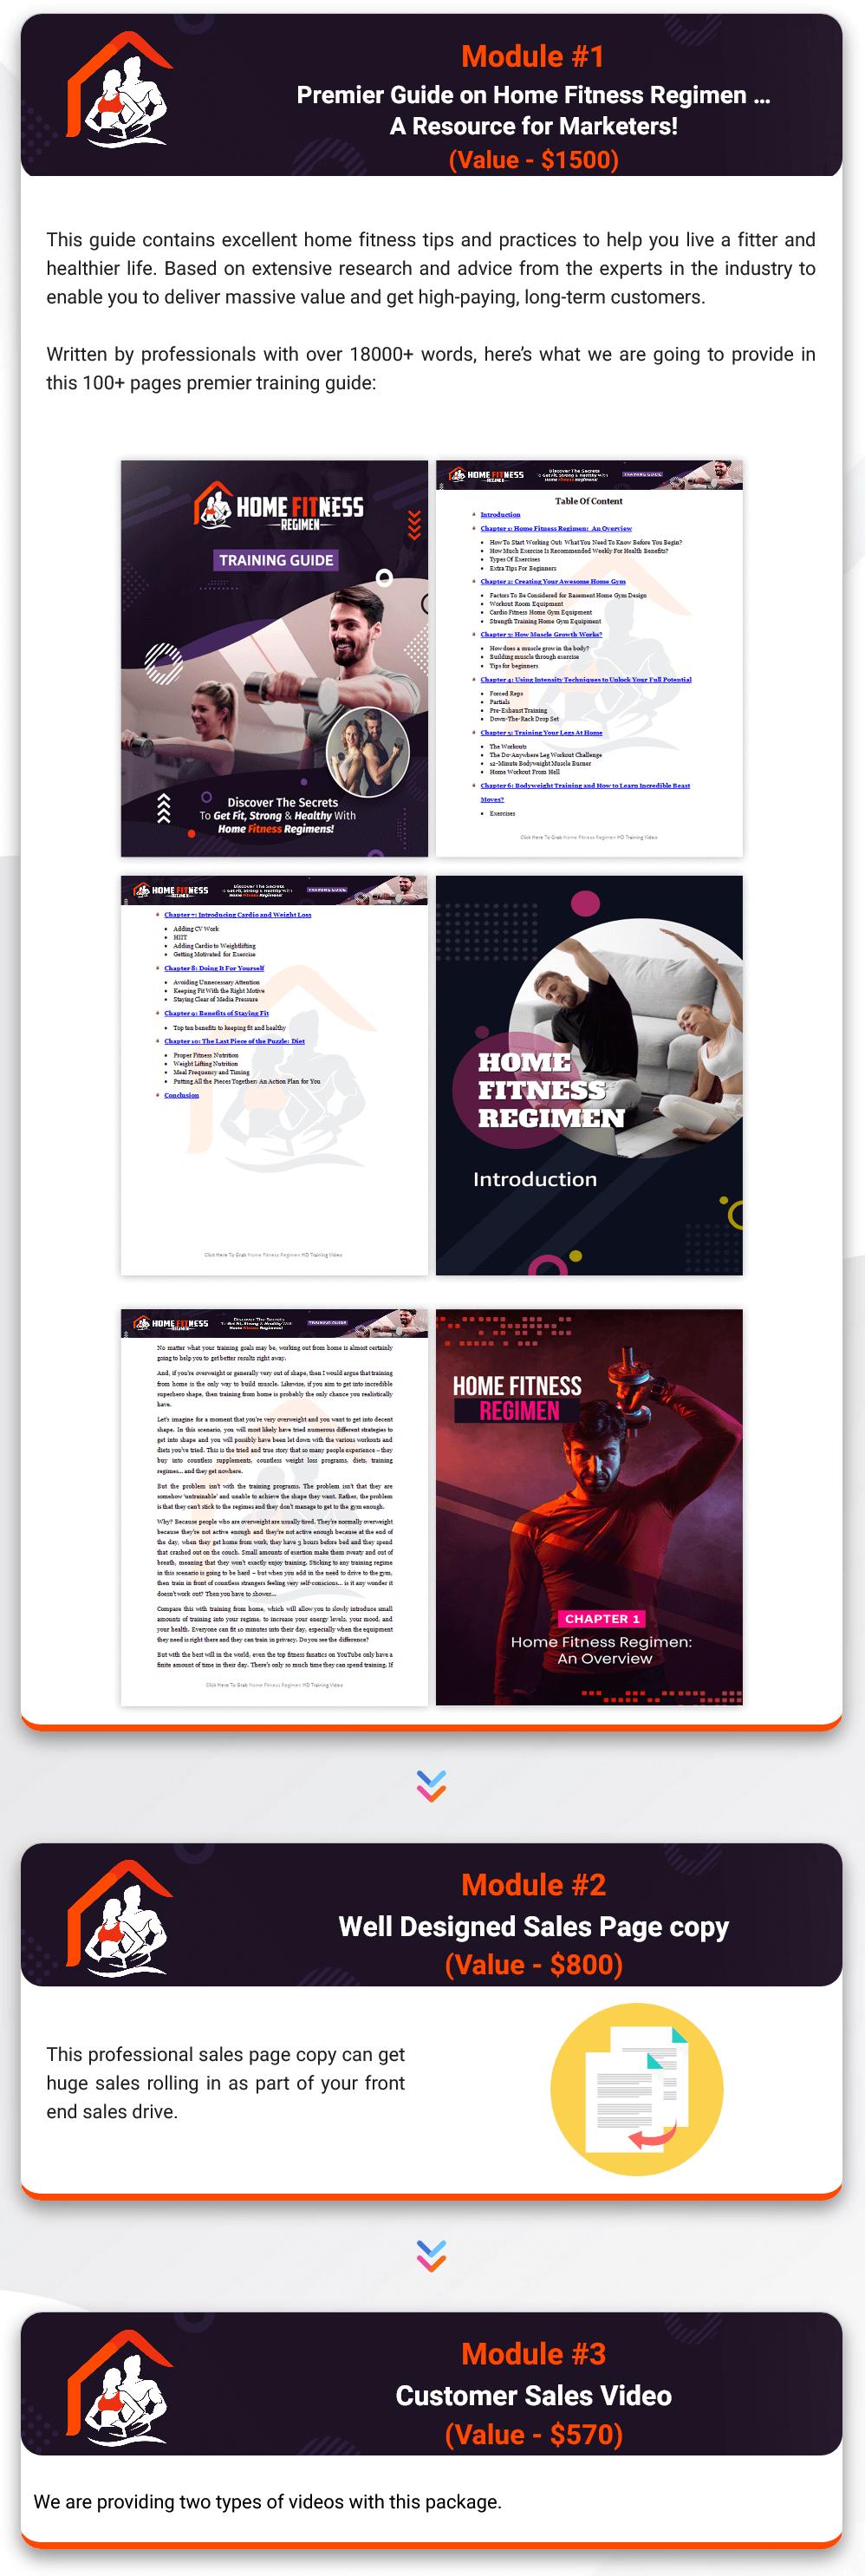 PLR-Home-Fitness-Regimen-feature-1